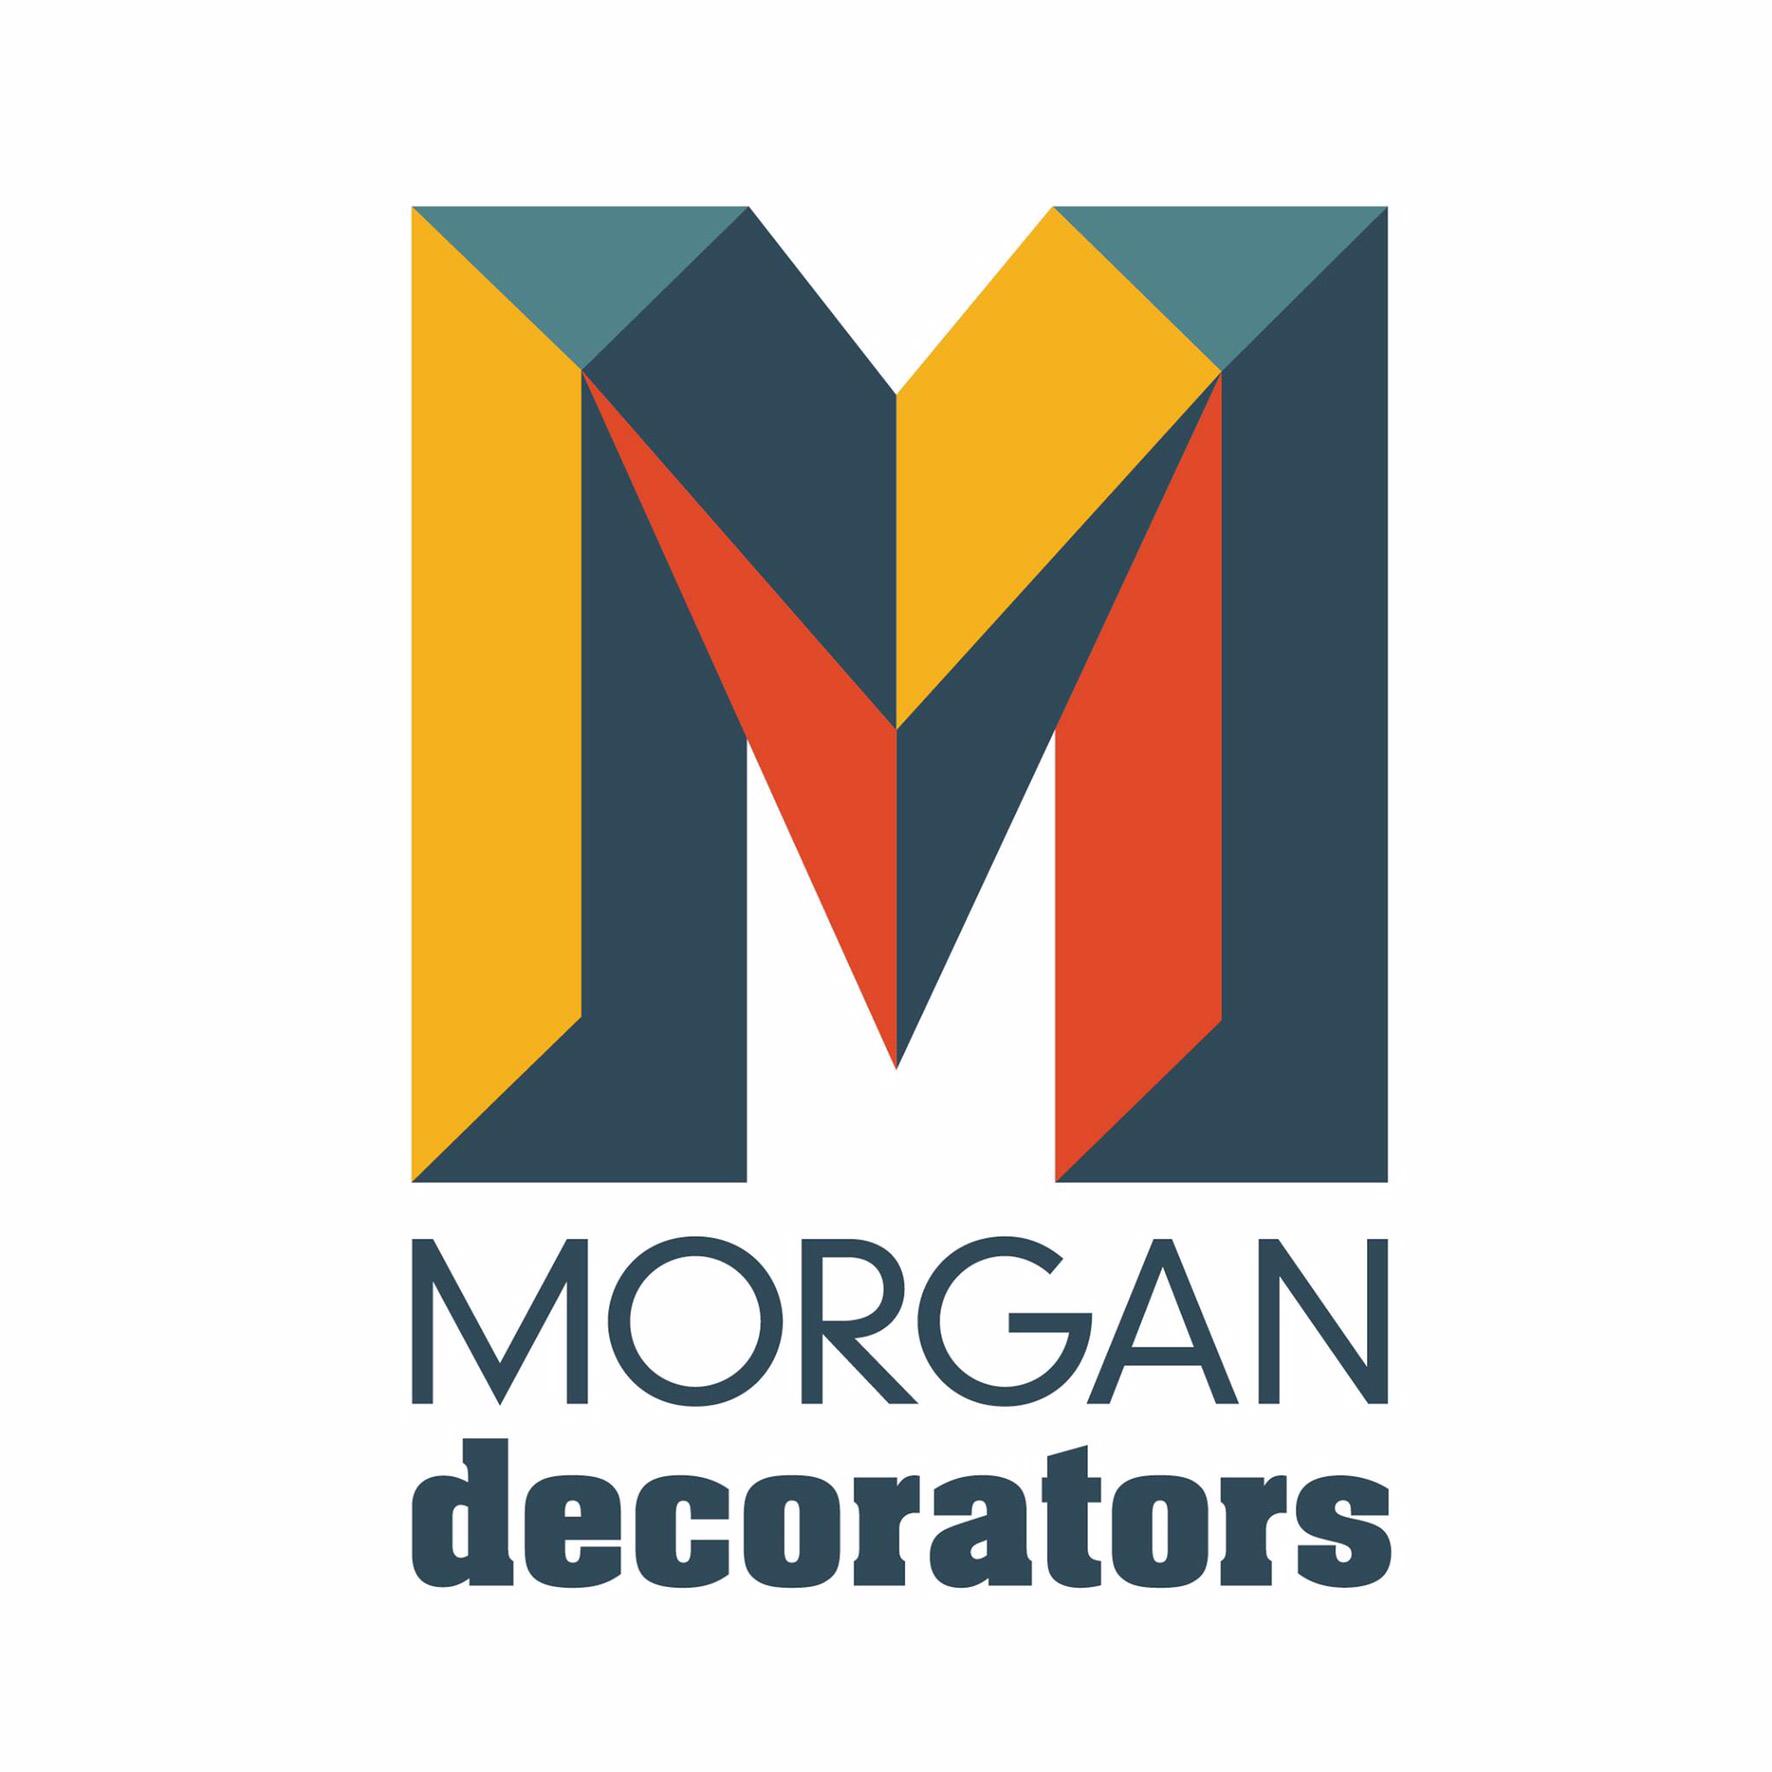 Morgan Decorators Verified Logo